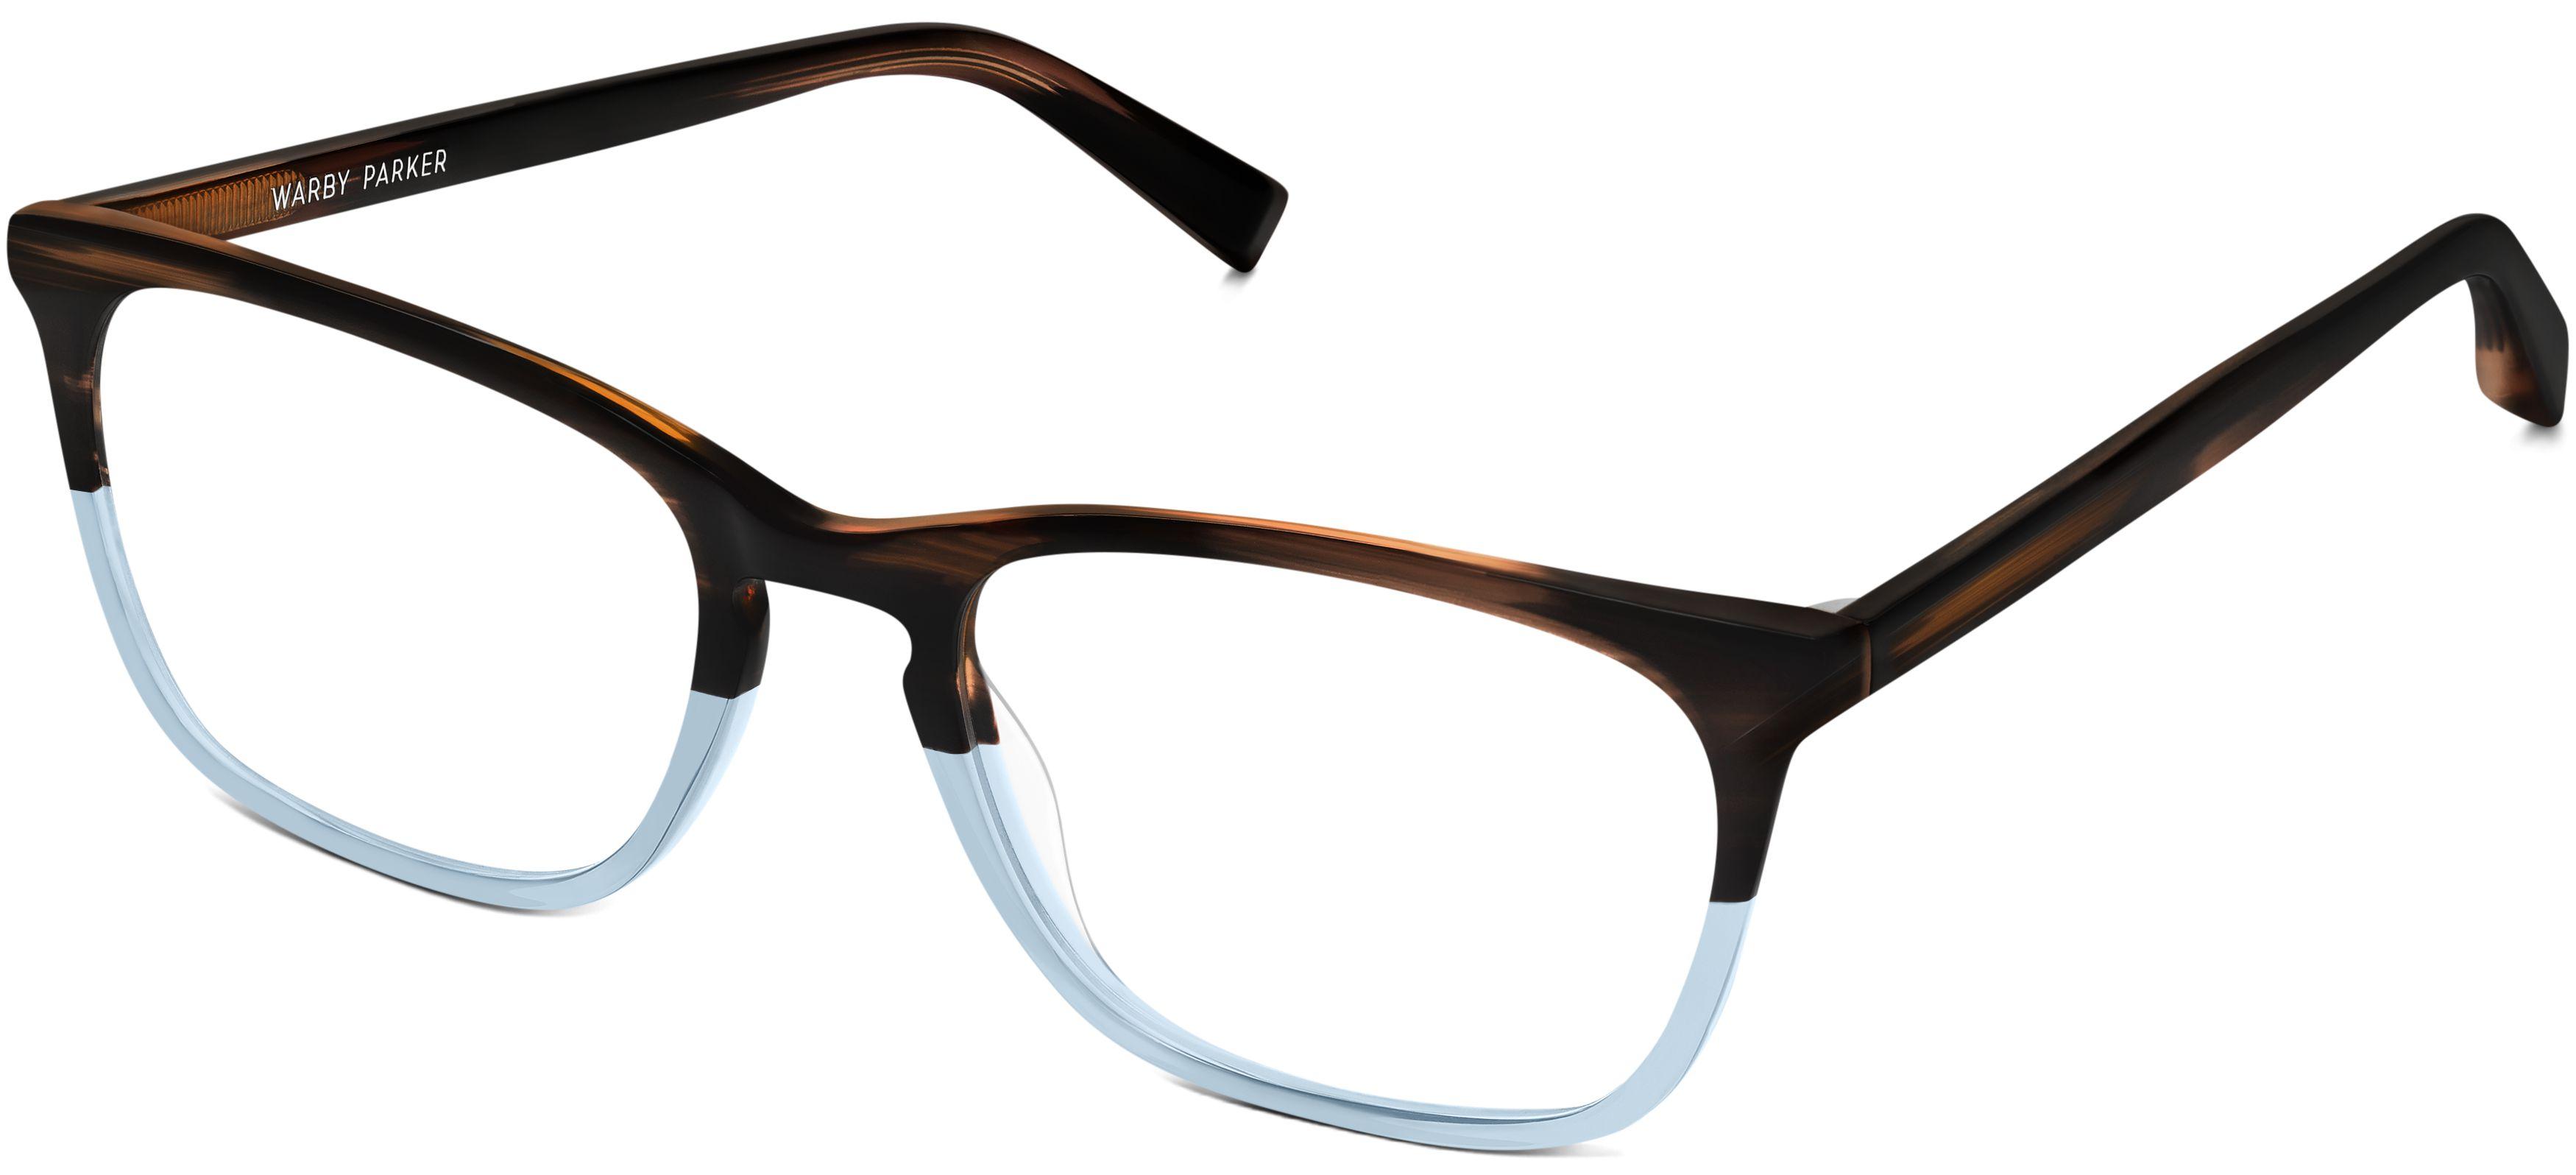 414c68e64fb Welty Eyegles In Eastern Bluebird Fade For Women Warby Parker